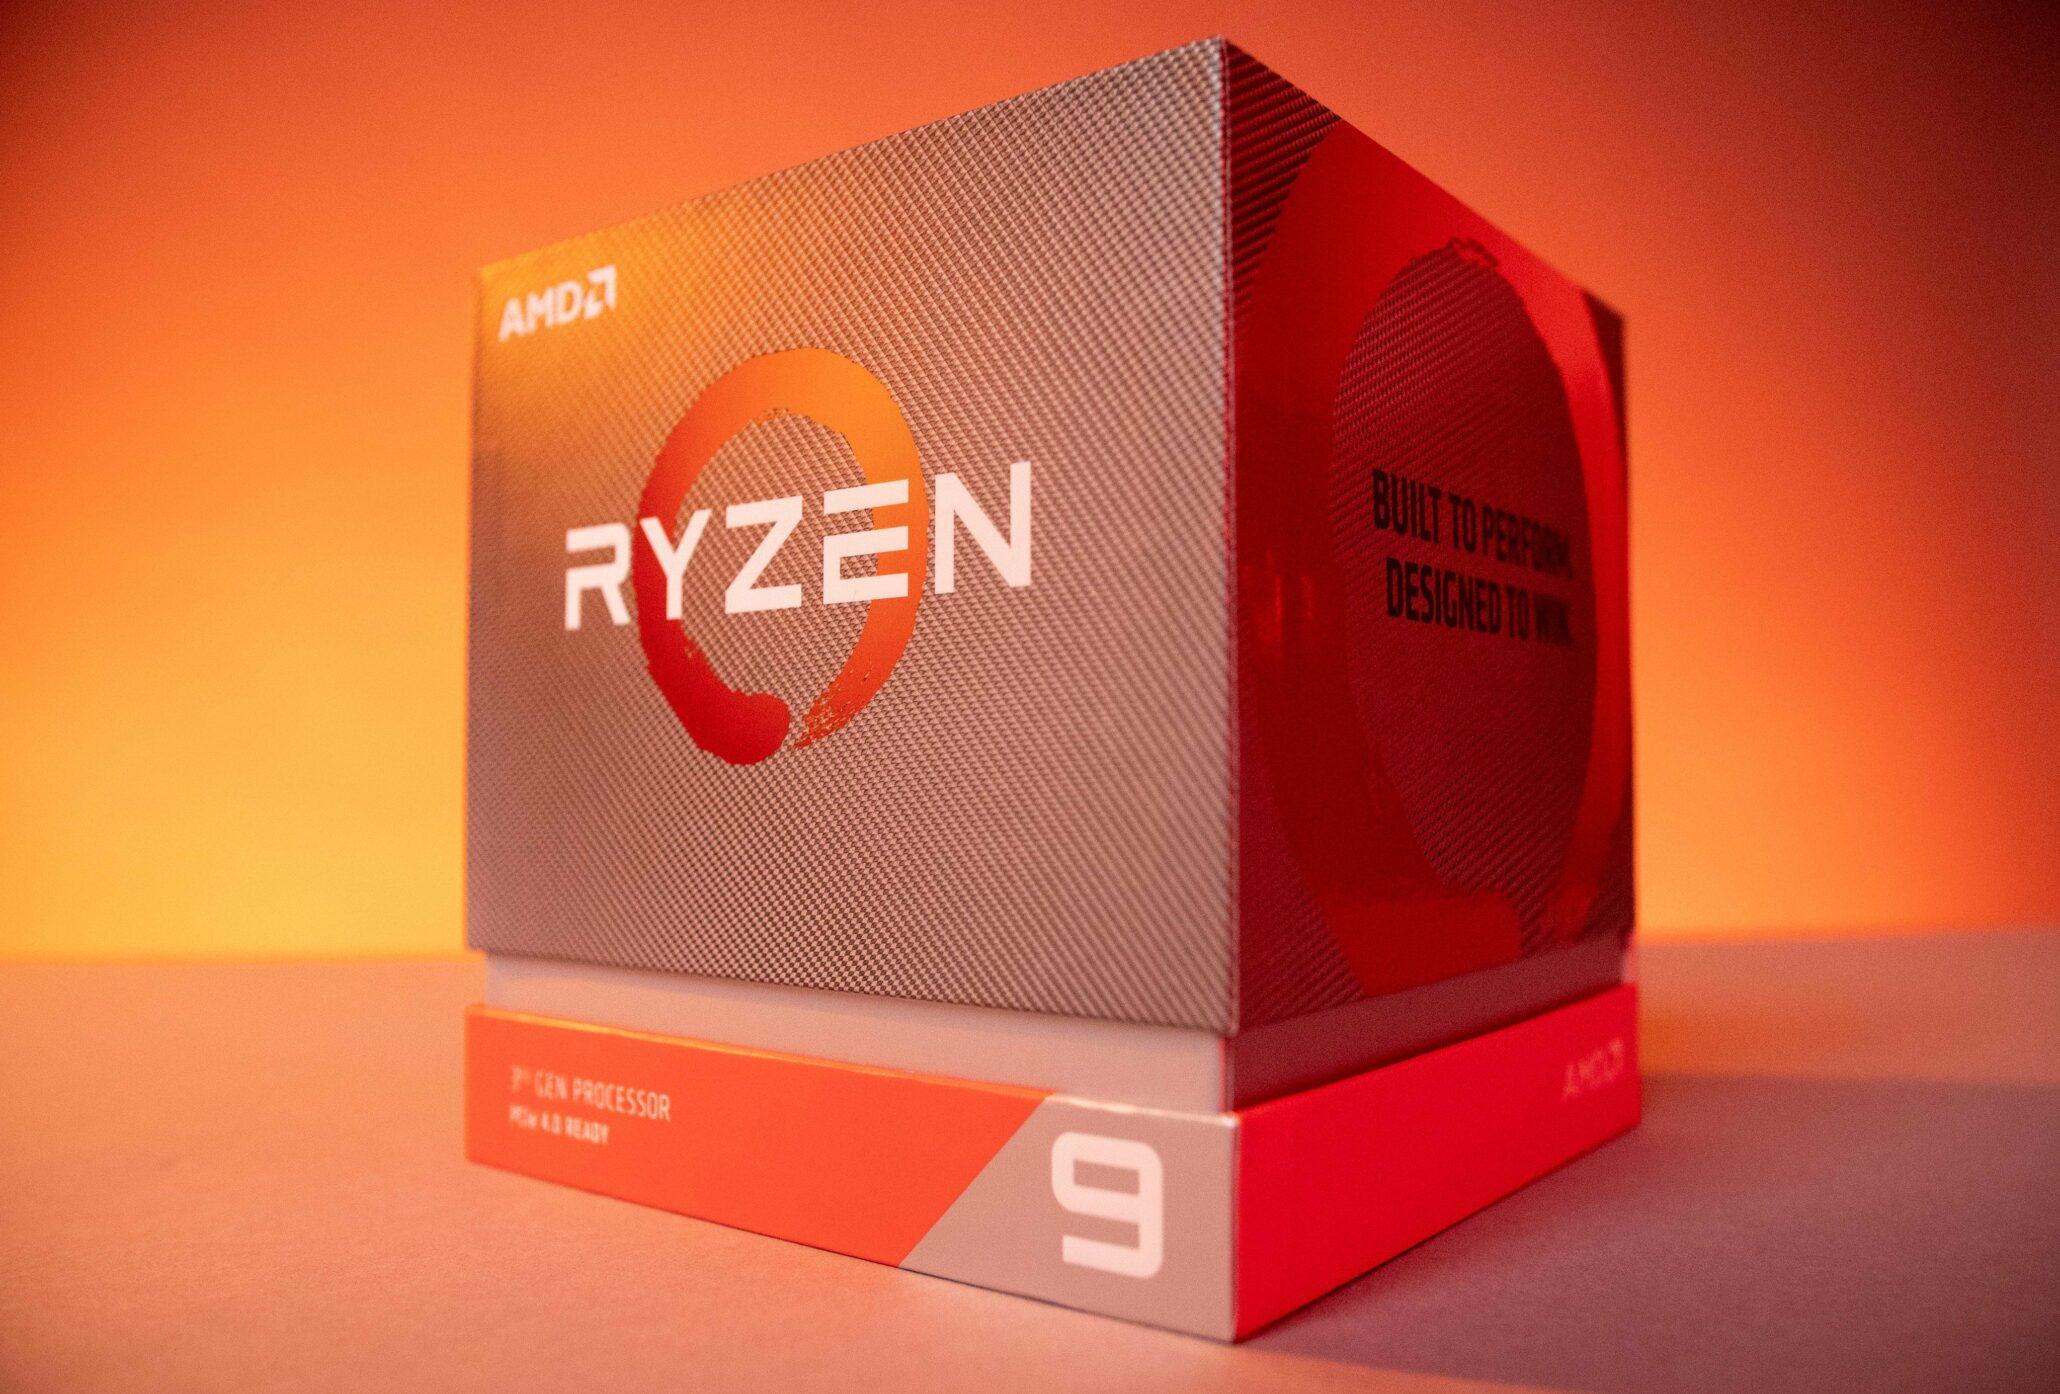 Amd Ryzen 9 3900xt Ryzen 7 3800xt Ryzen 5 3600xt Matisse Refresh Desktop Cpus Confirmed